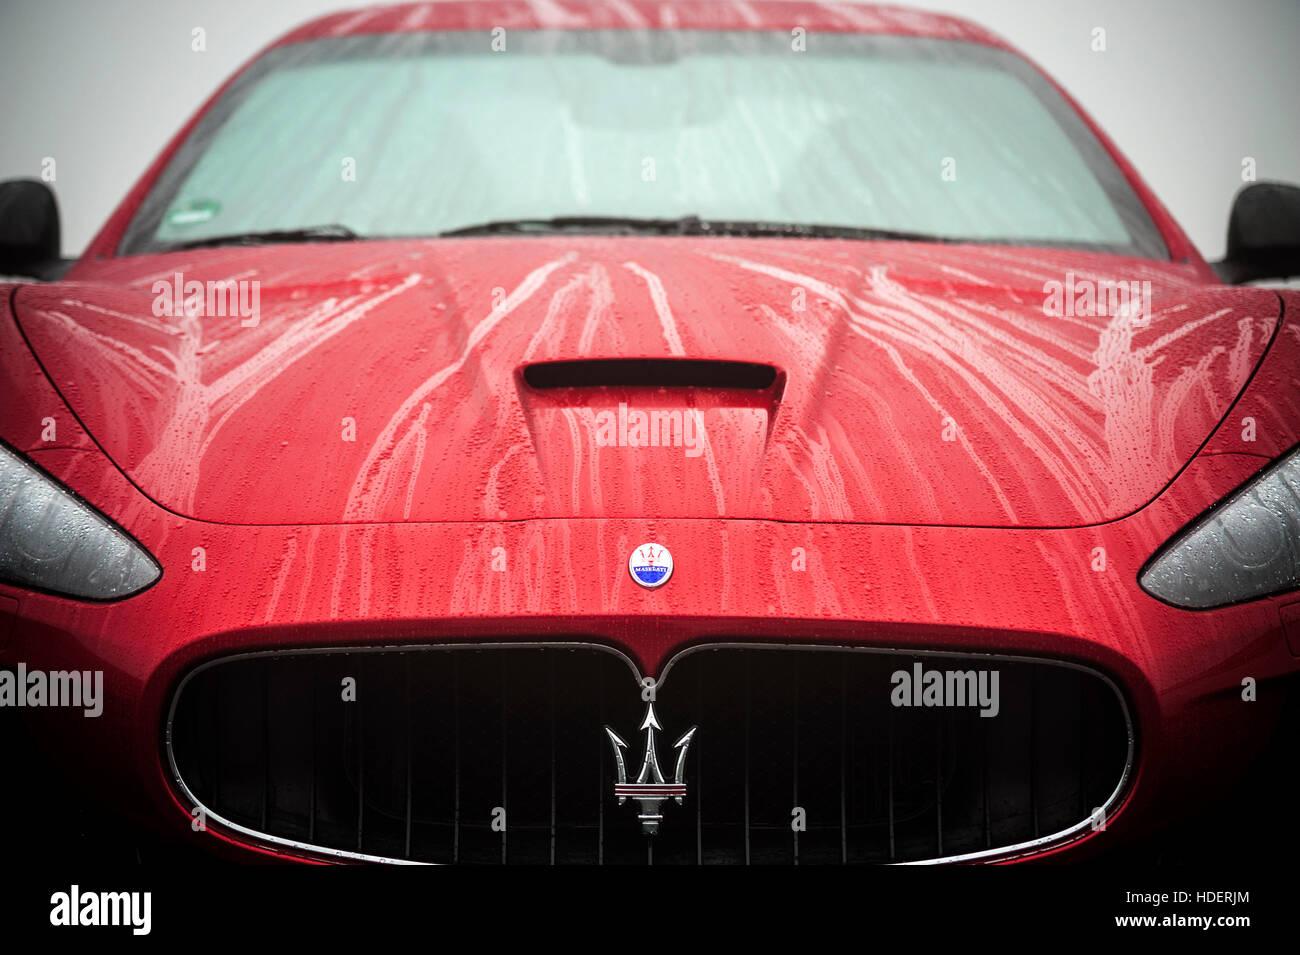 Red Maserati Ghibli - Stock Image